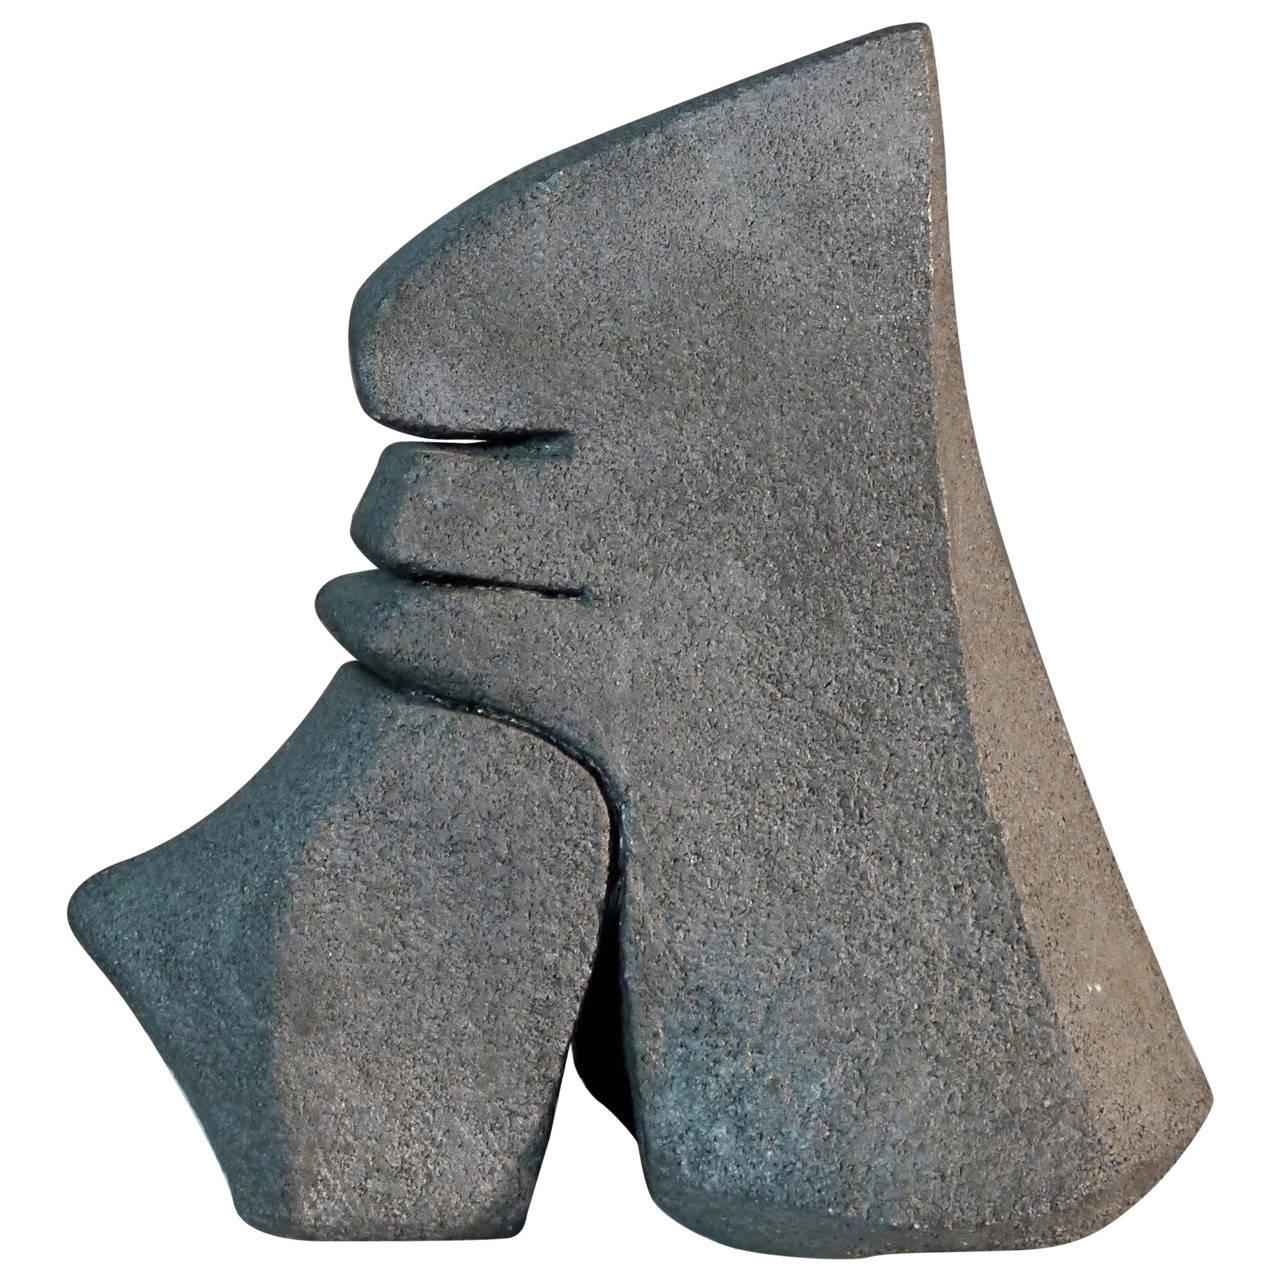 Stoneware Sculpture by Josette Barbier, 1980